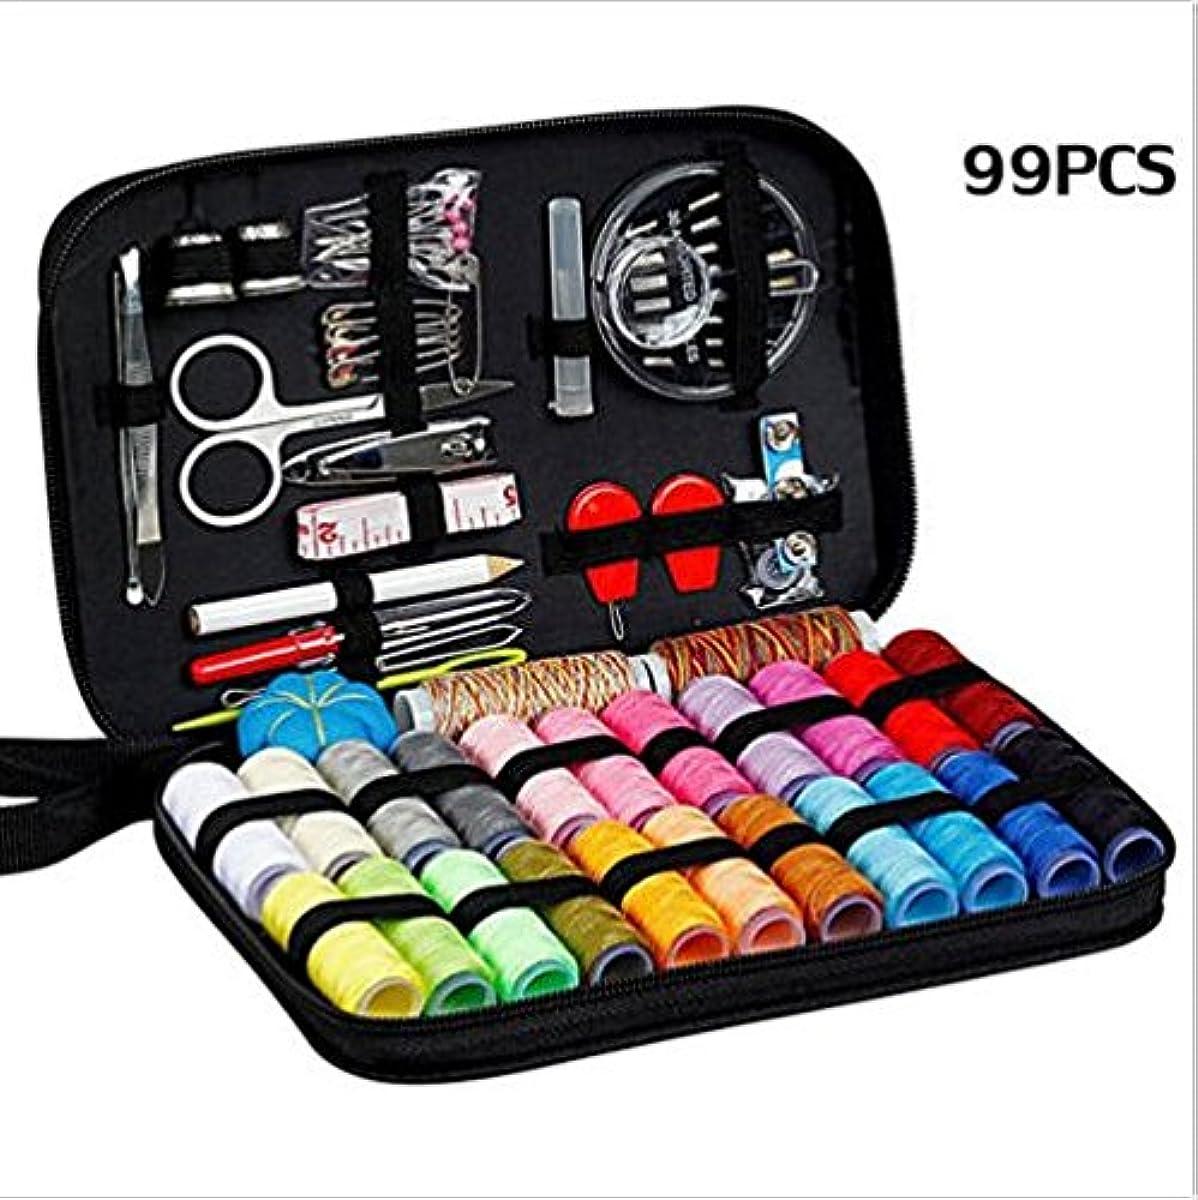 99pcs Sewing Kit Travel Bag Needles Thread Scissor Tape Accessories Craft Repair (US Stock)